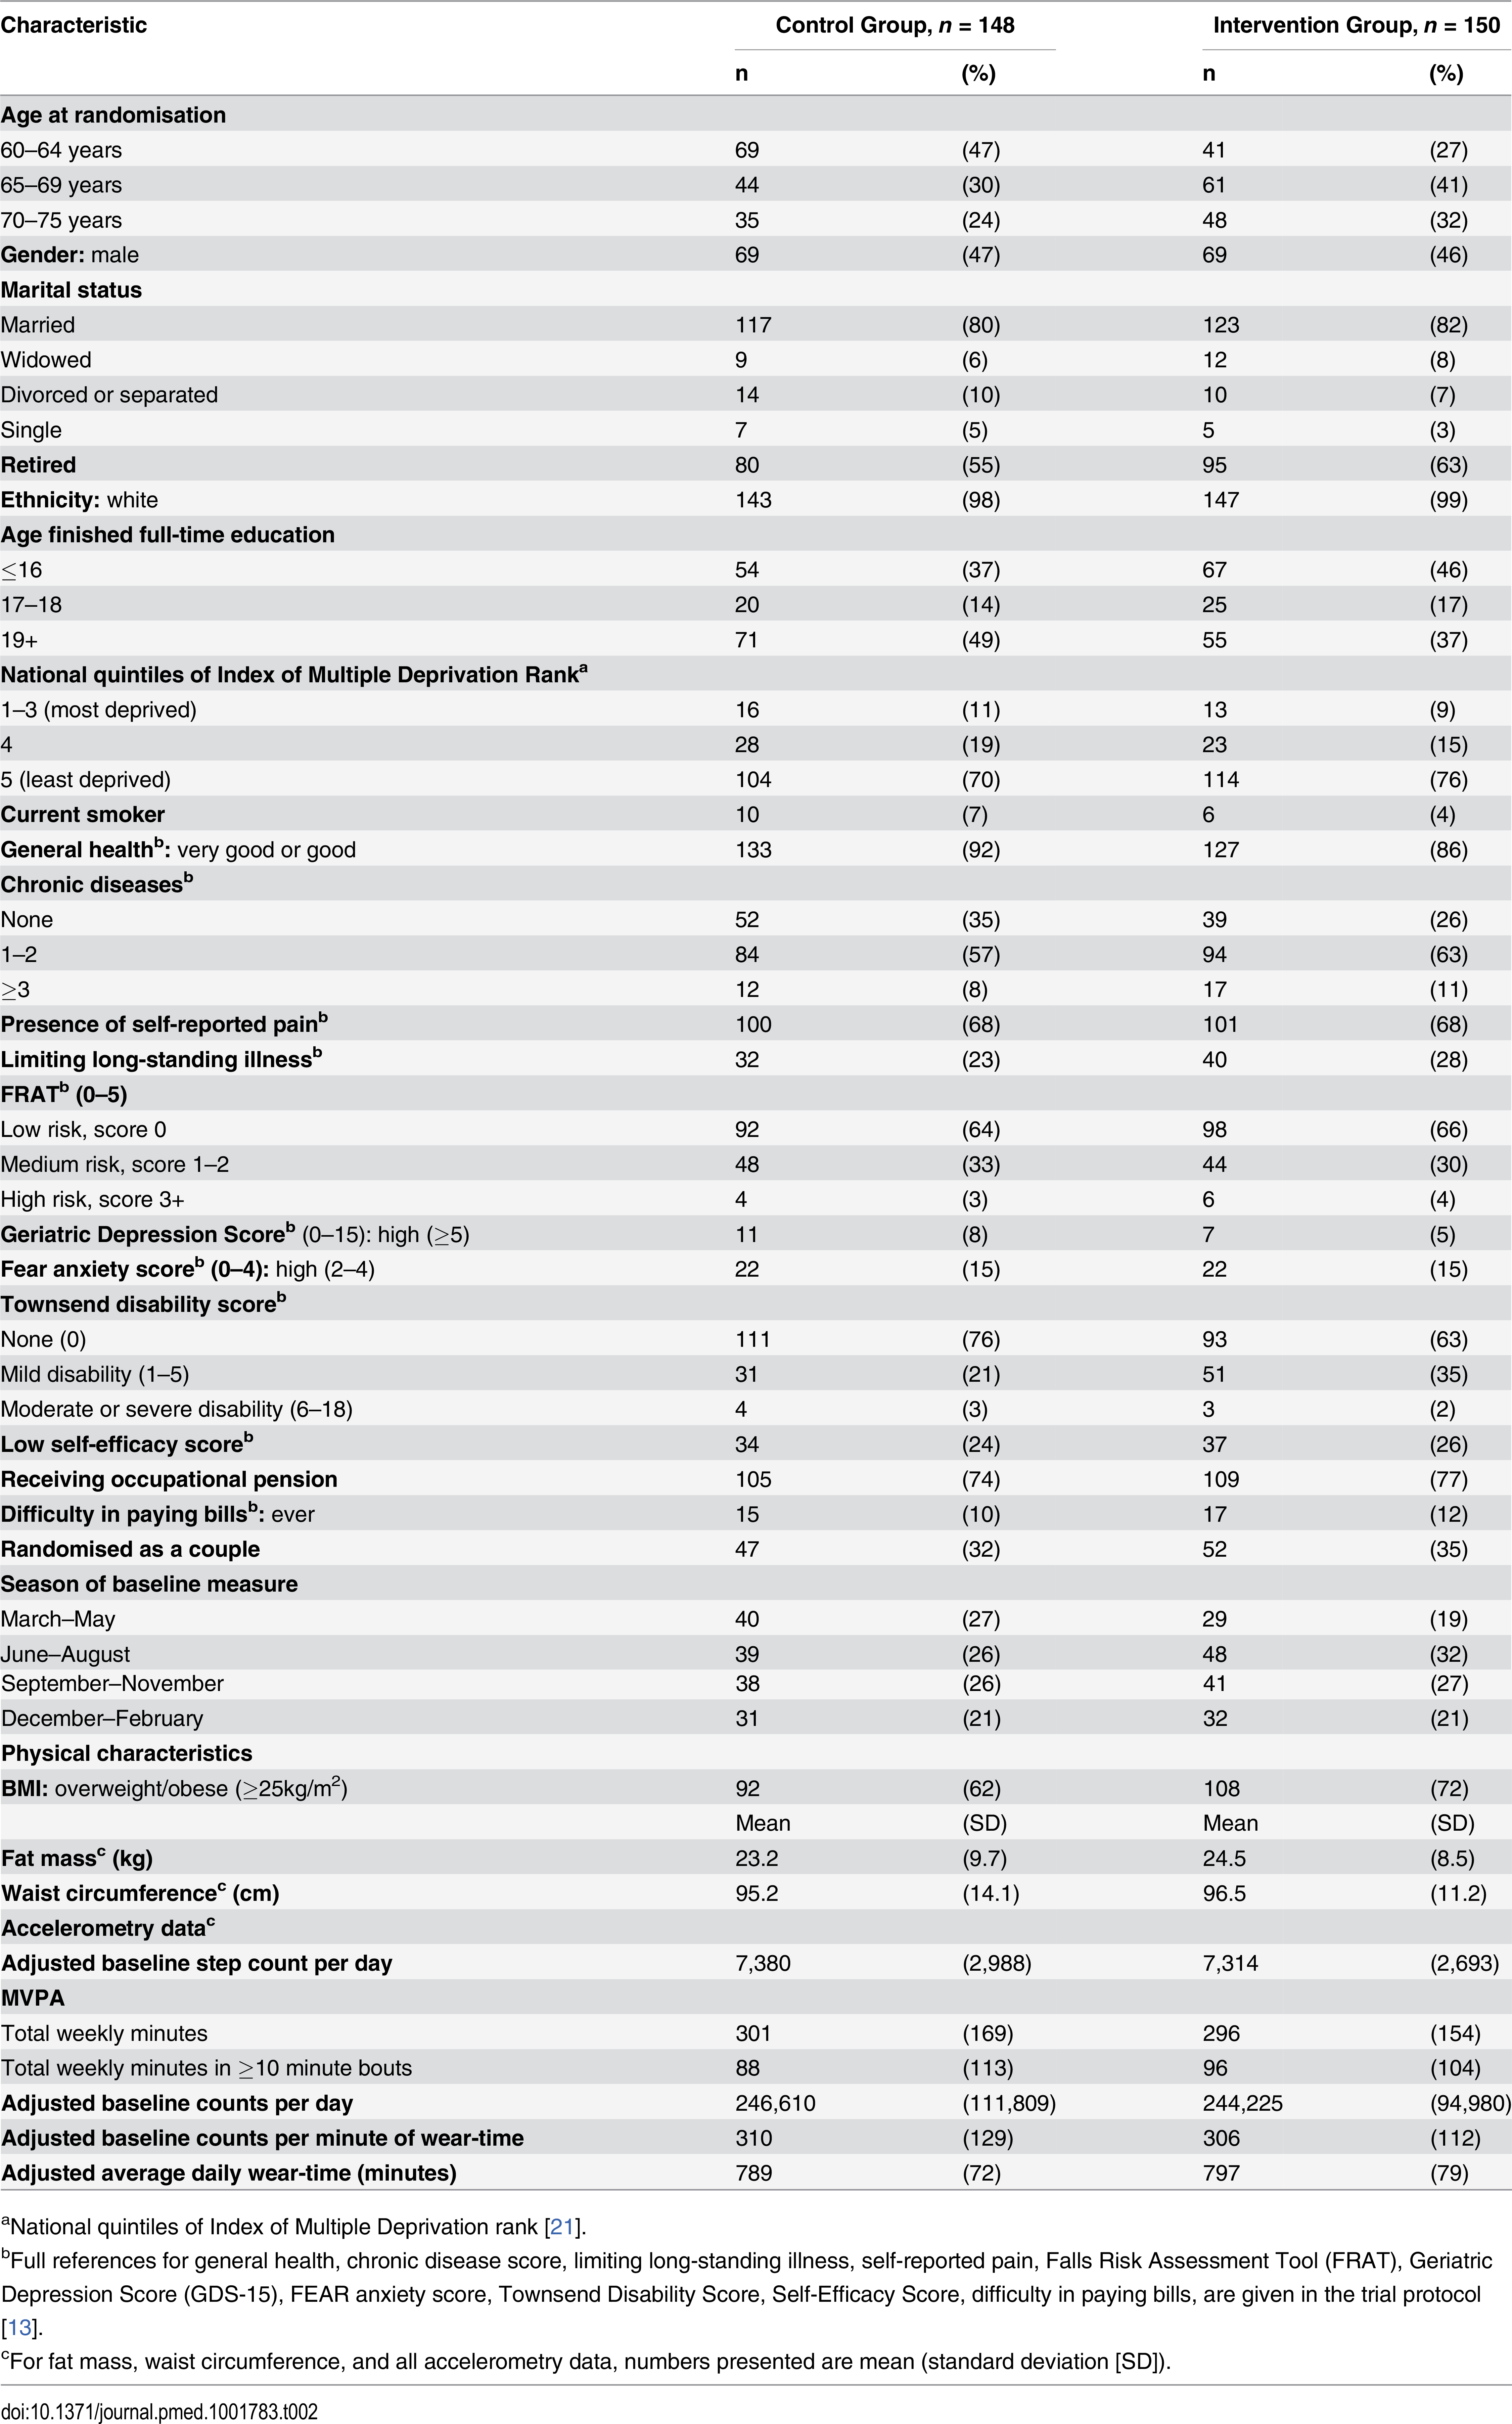 Baseline characteristics of 298 randomised participants.